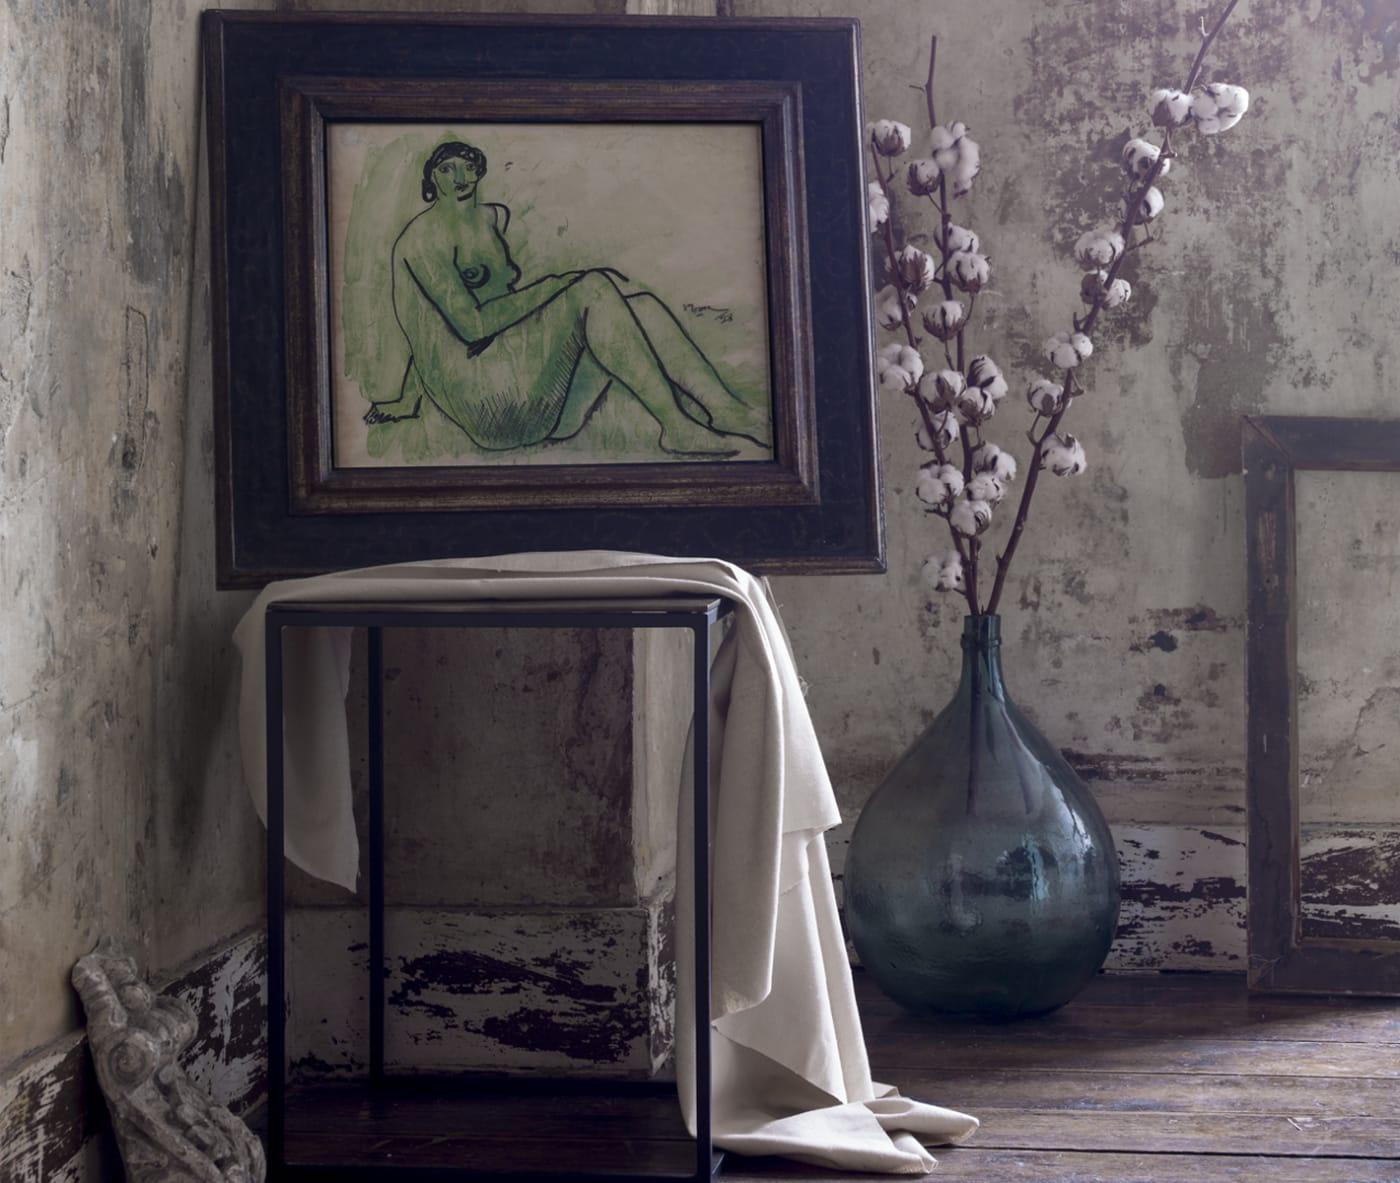 Art in Isolation | Series 2